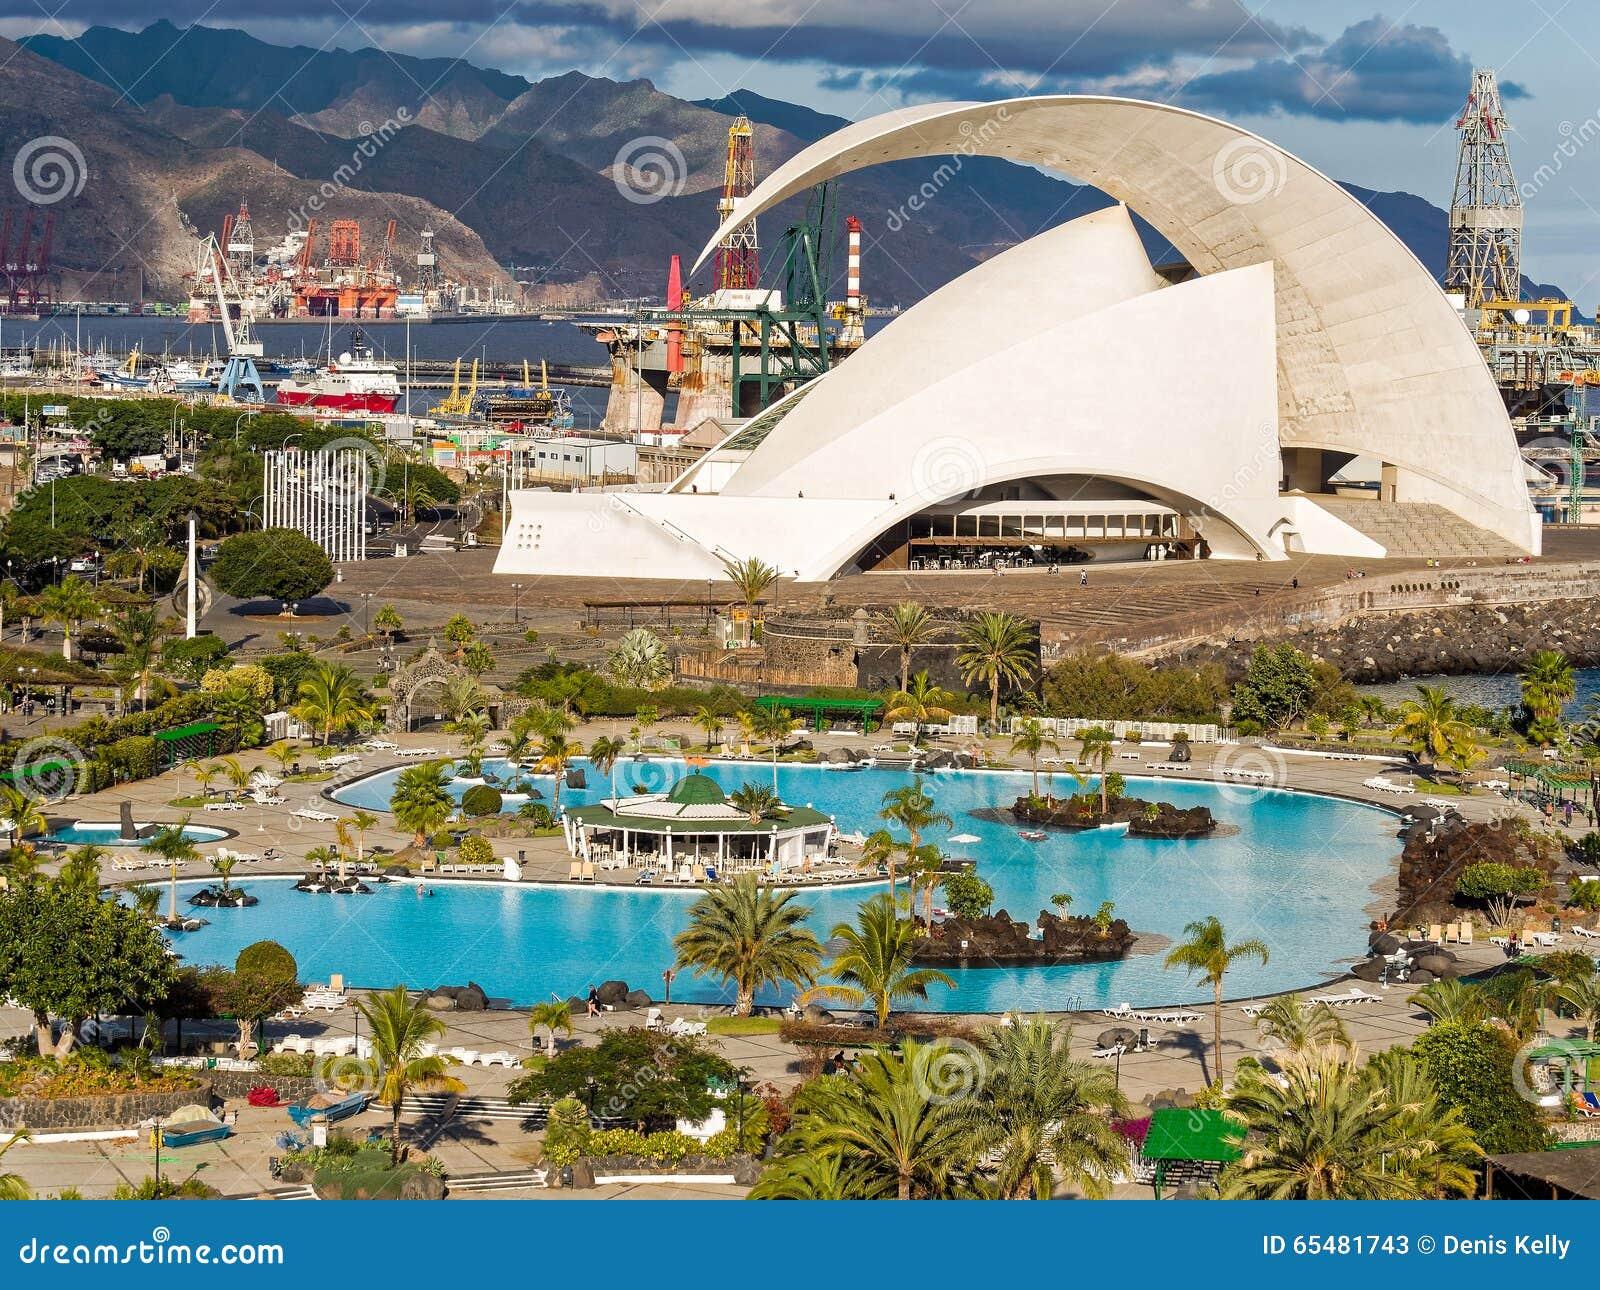 Tenerife spain november 19 2015 penguins on the for Gimnasio santa cruz de tenerife